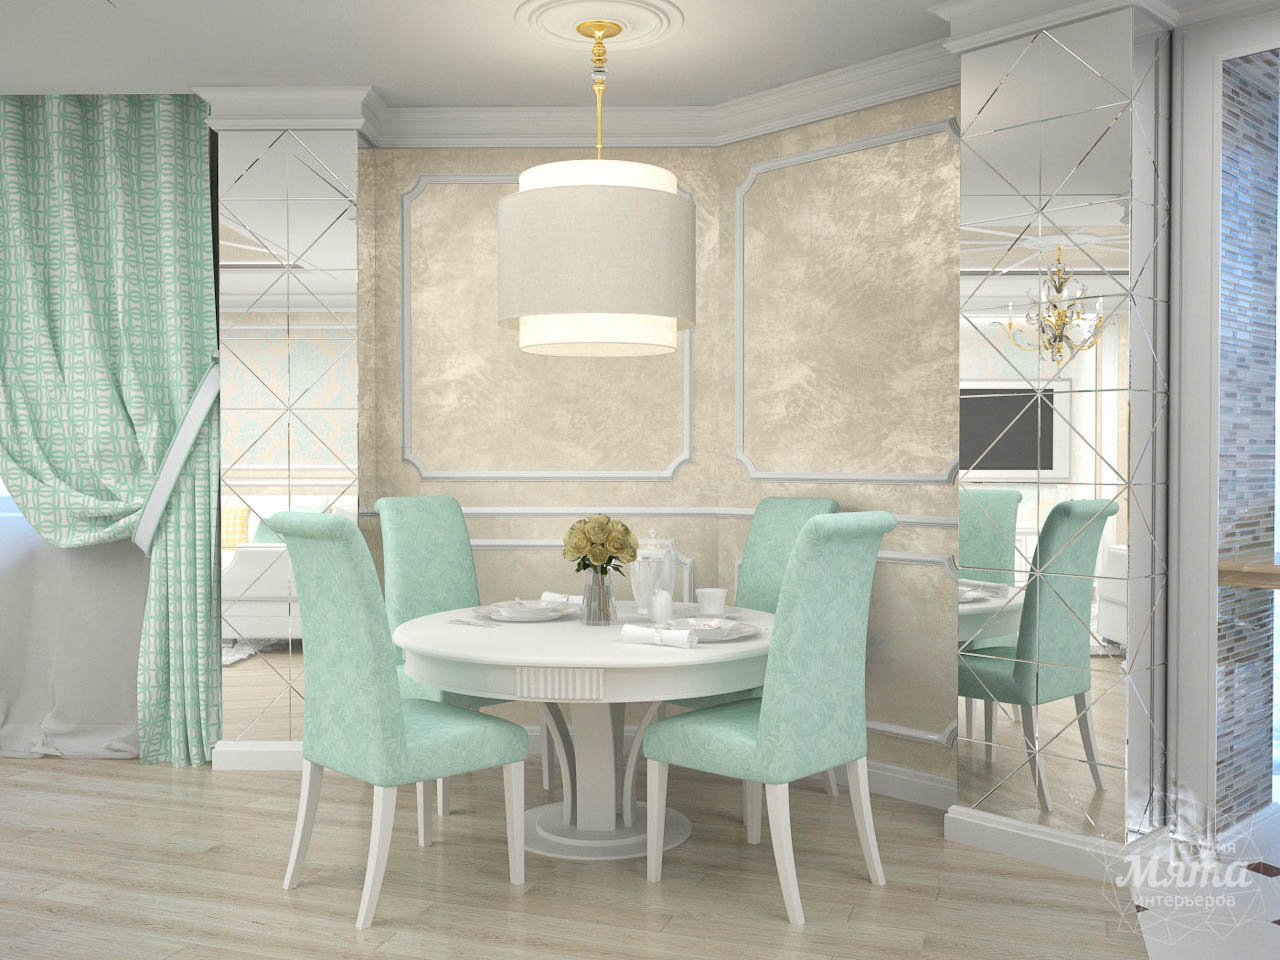 Дизайн интерьера и ремонт трехкомнатной квартиры по ул. 8 Марта 190 img1968749590